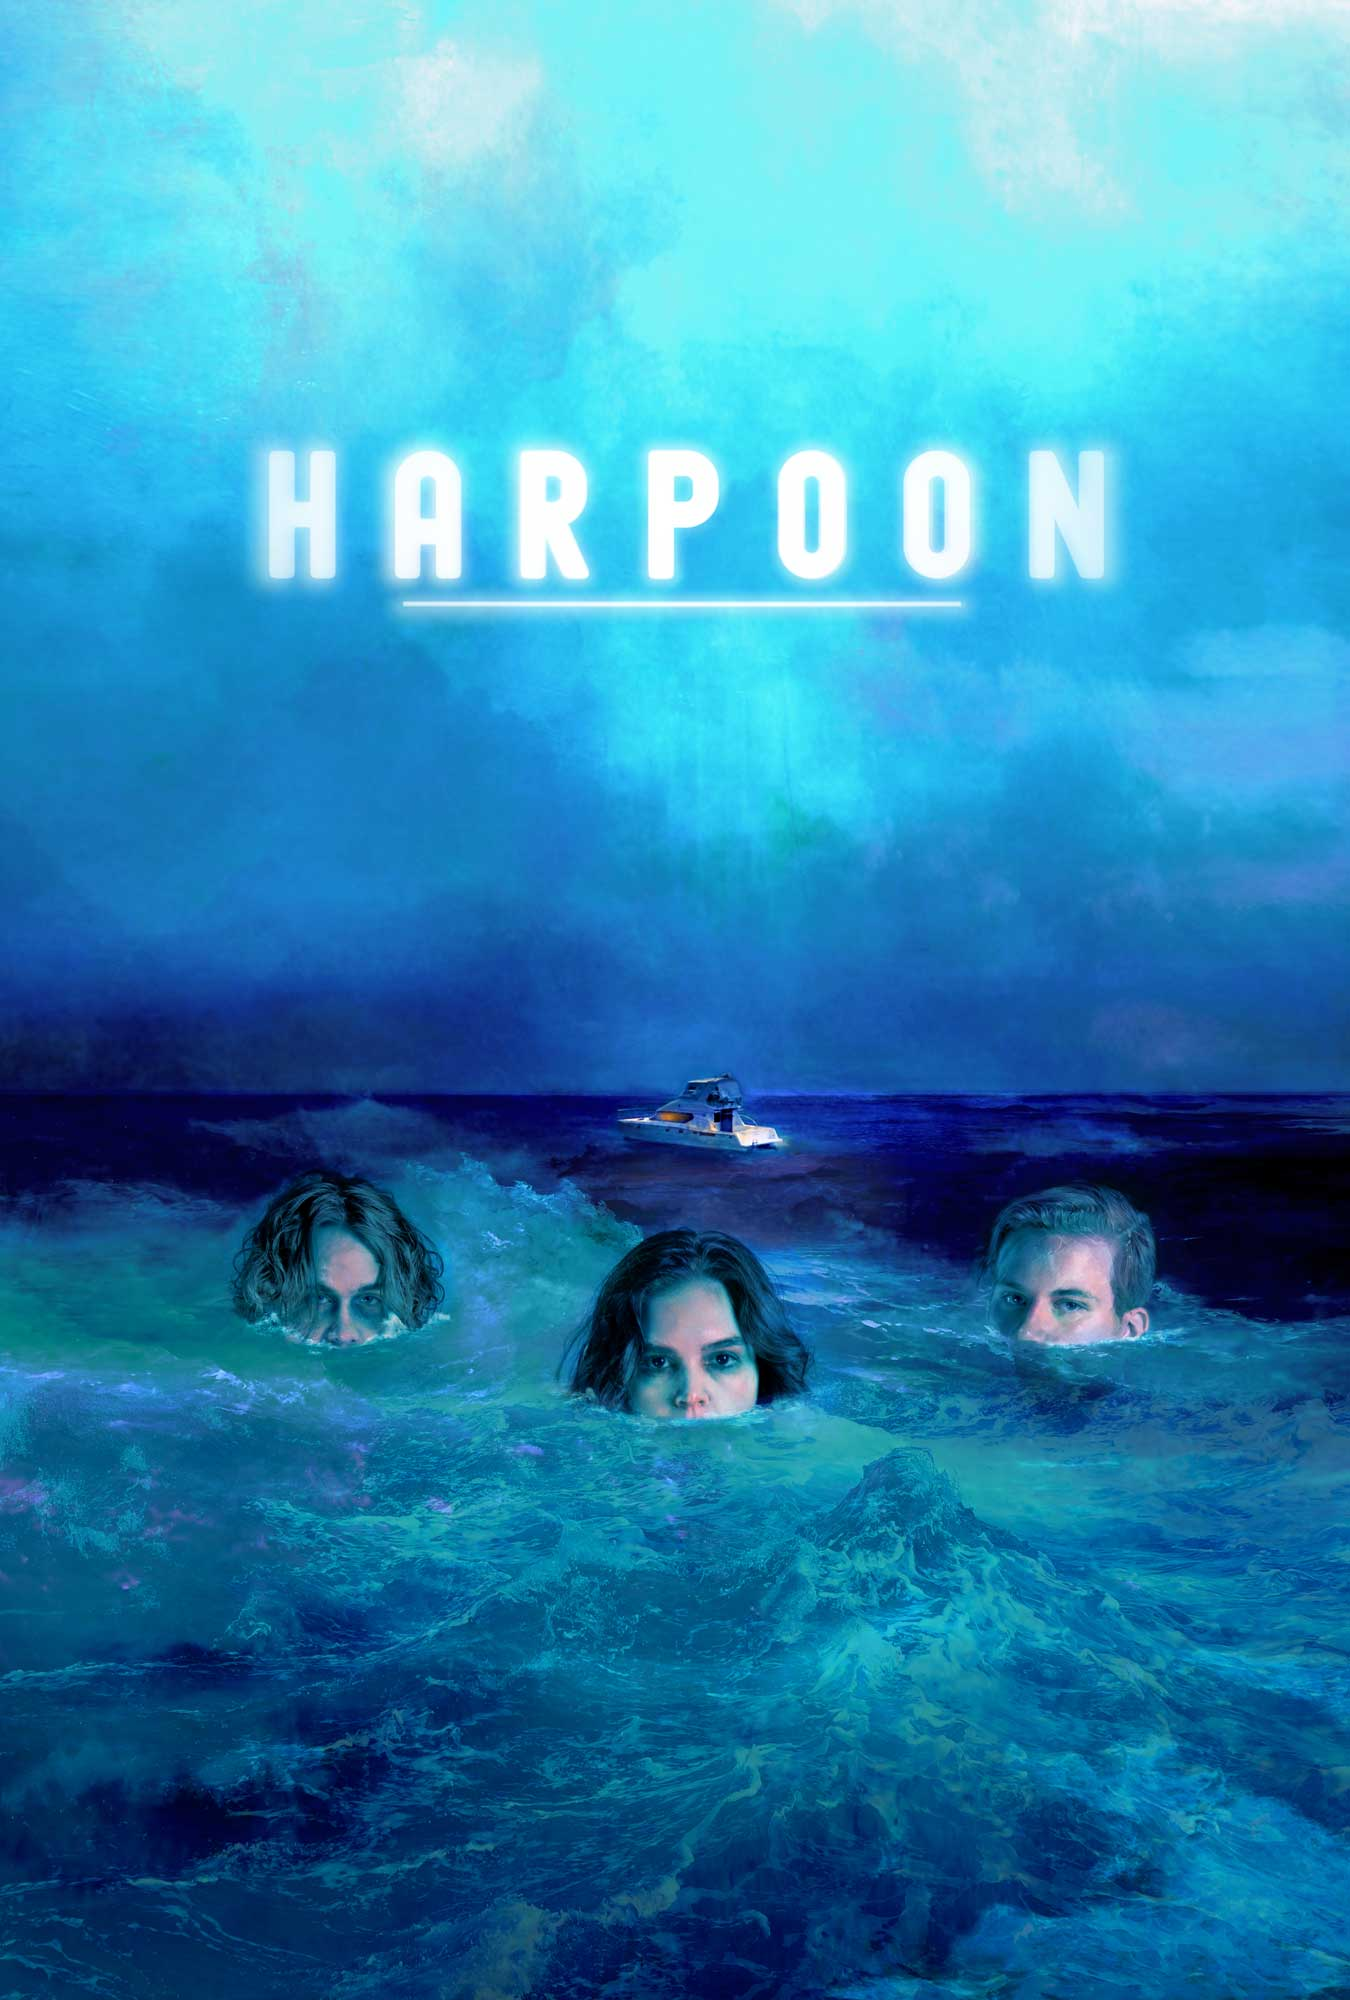 Harpoon, Epic Pictures